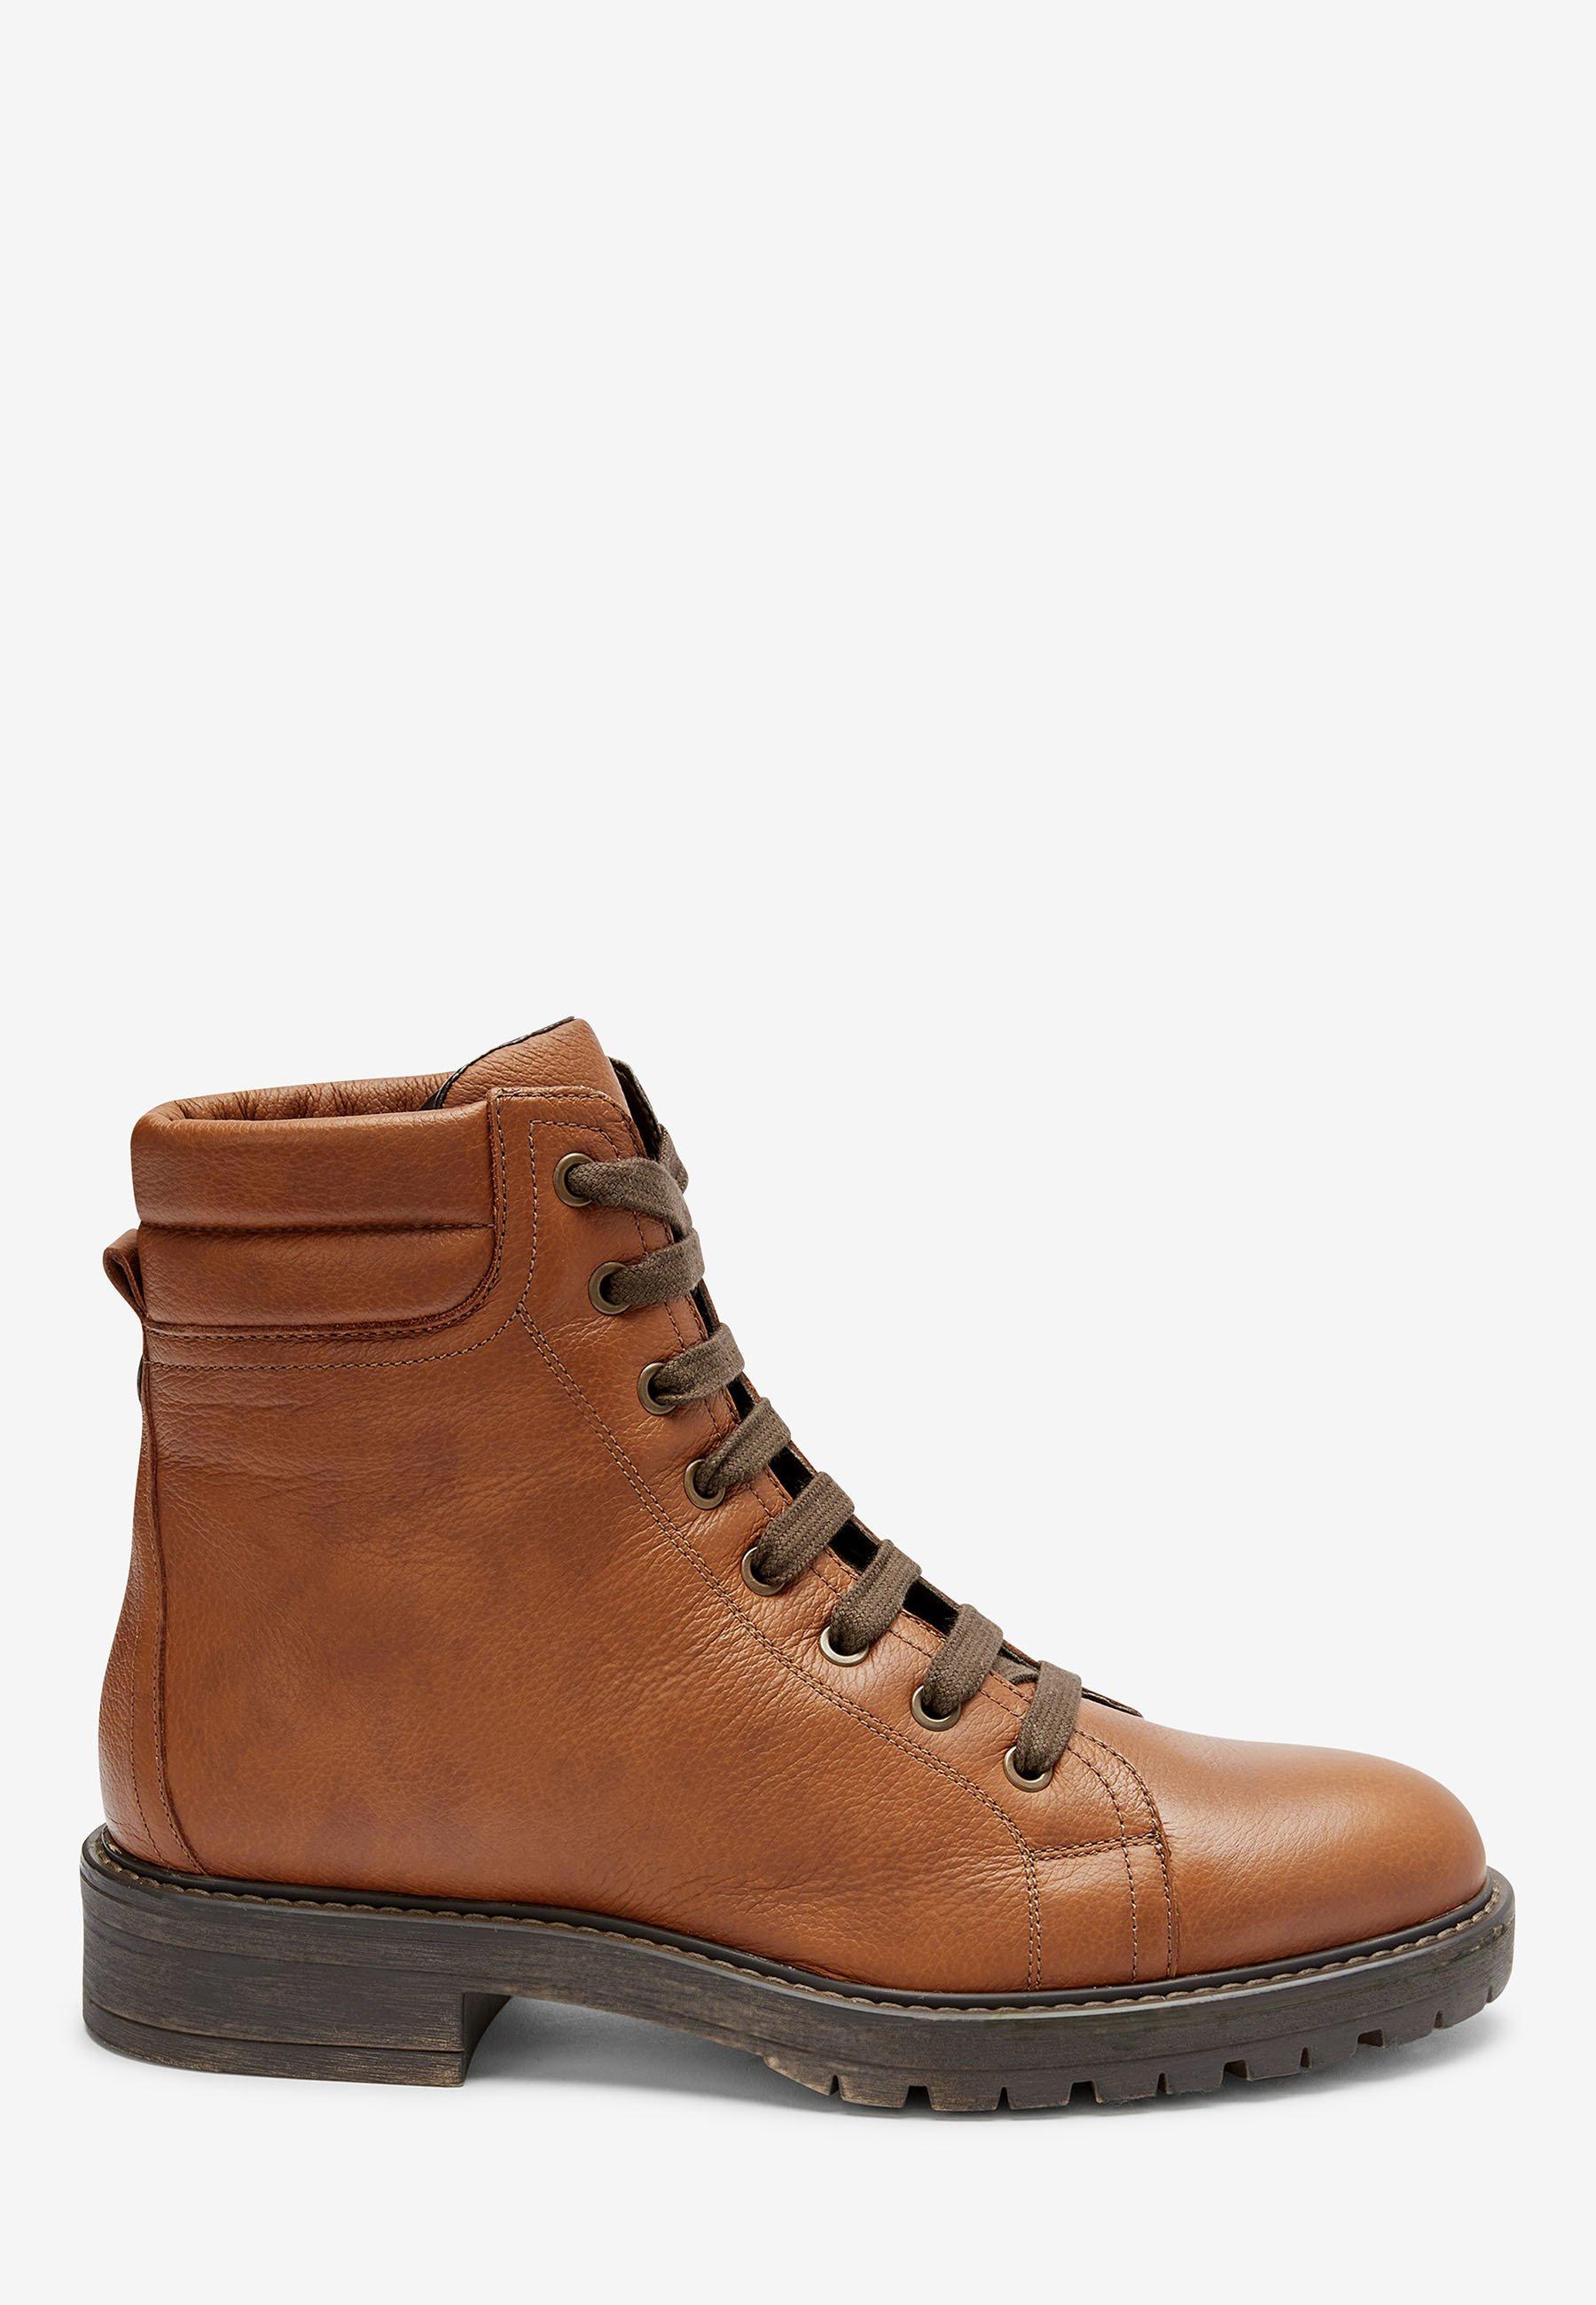 2020 Nuovo Scarpe da Donna Next TAN CHUNKY LACE UP ANKLE BOOTS Stivaletti stringati brown